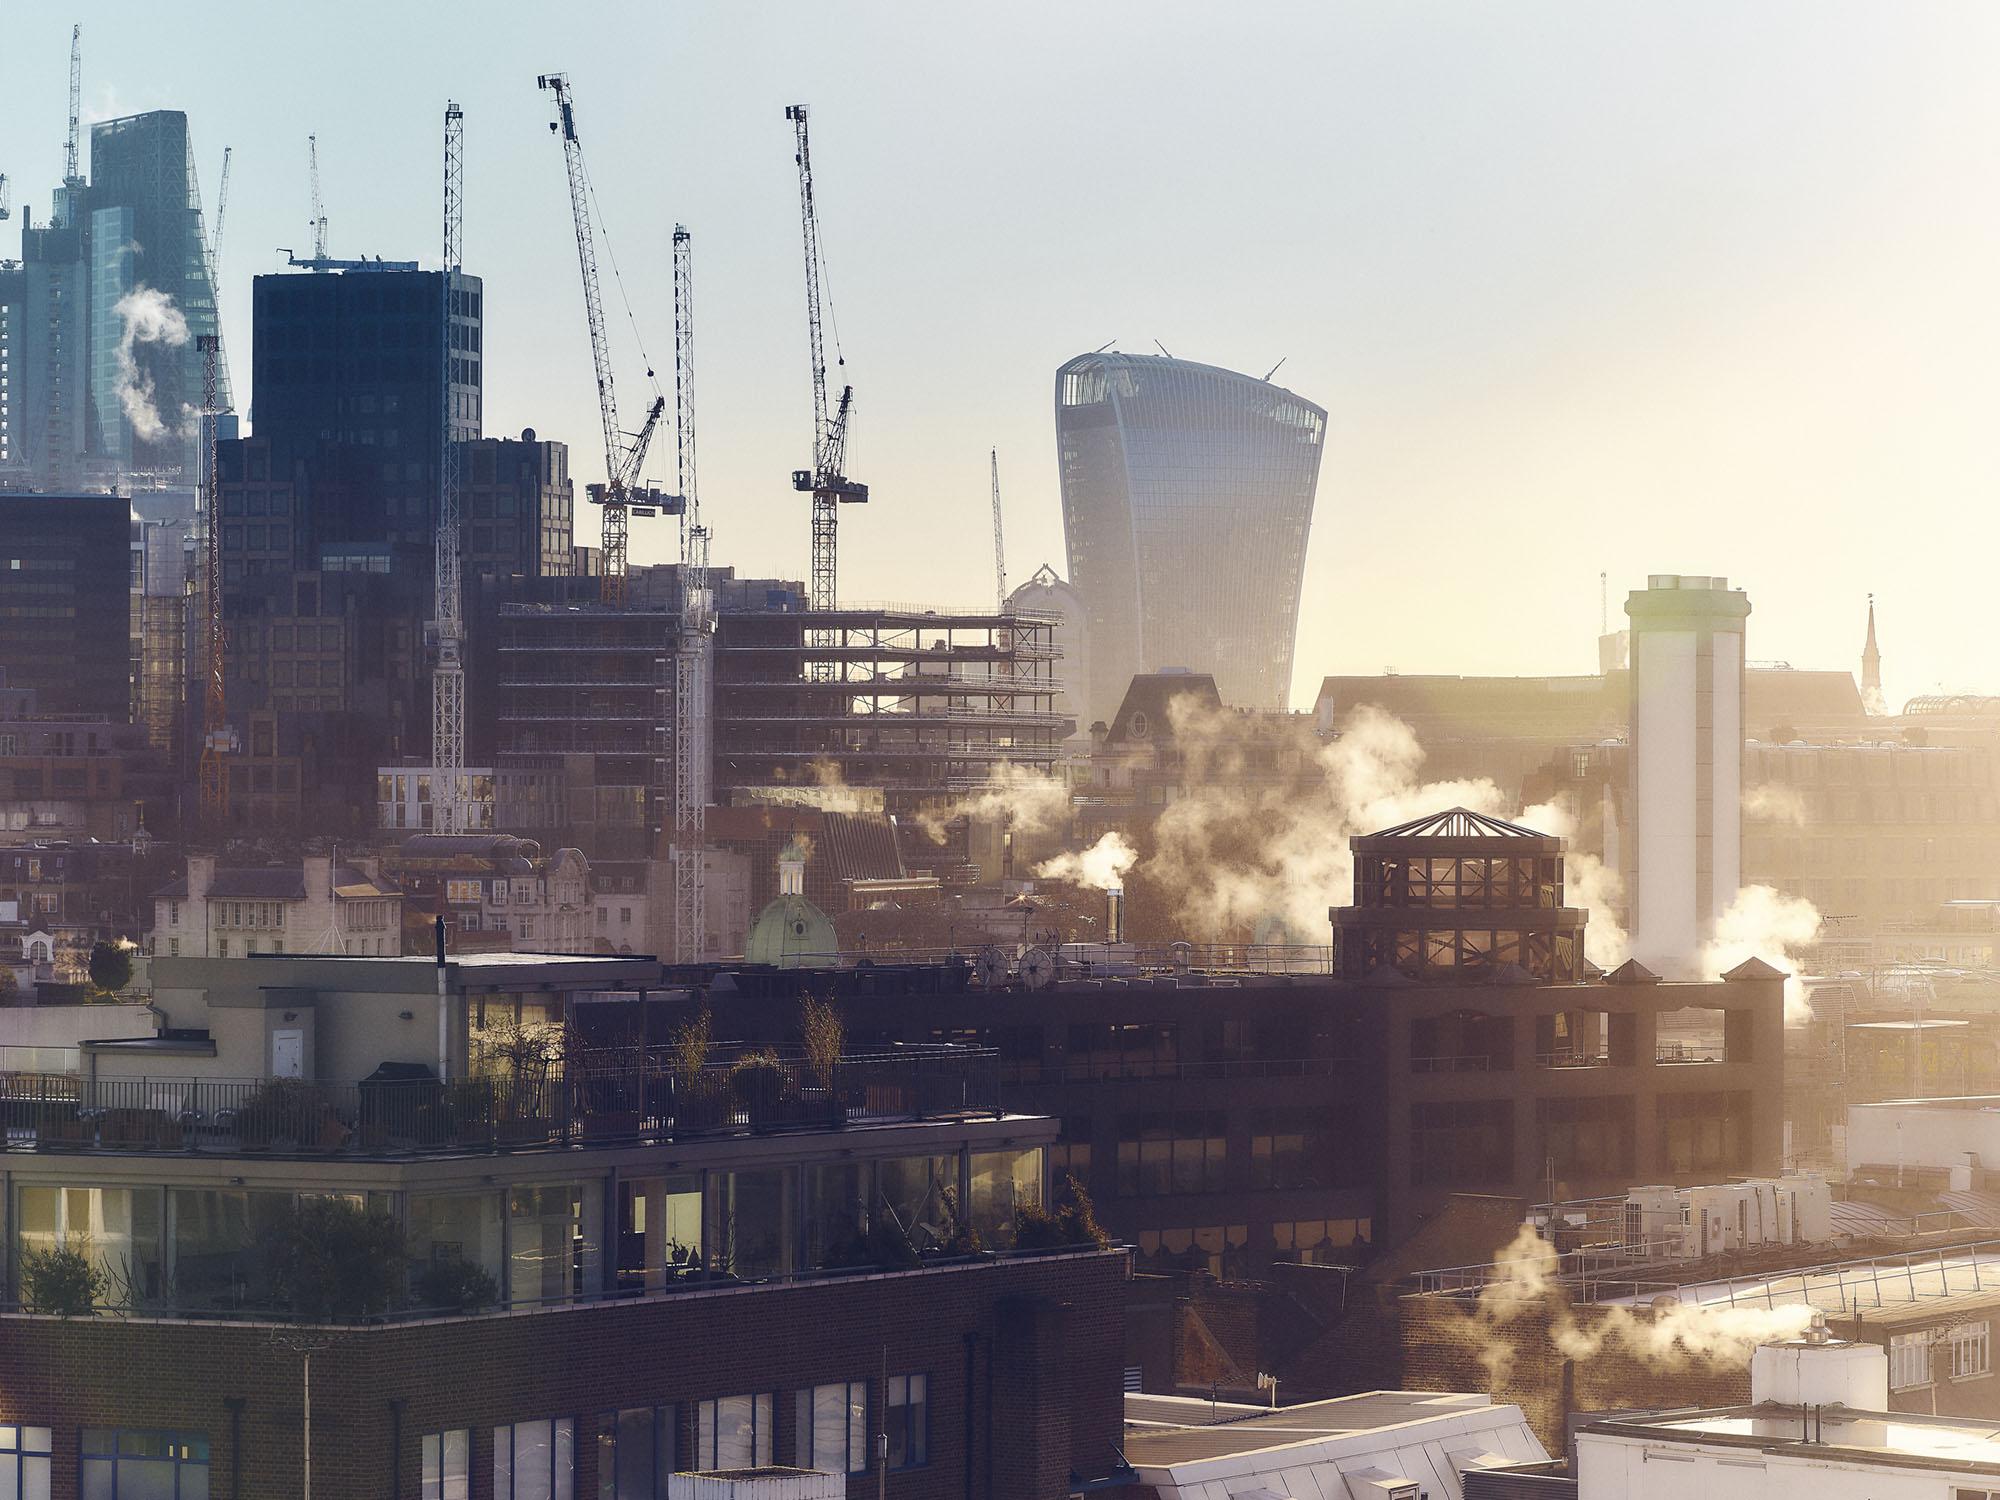 The City of London sunrise